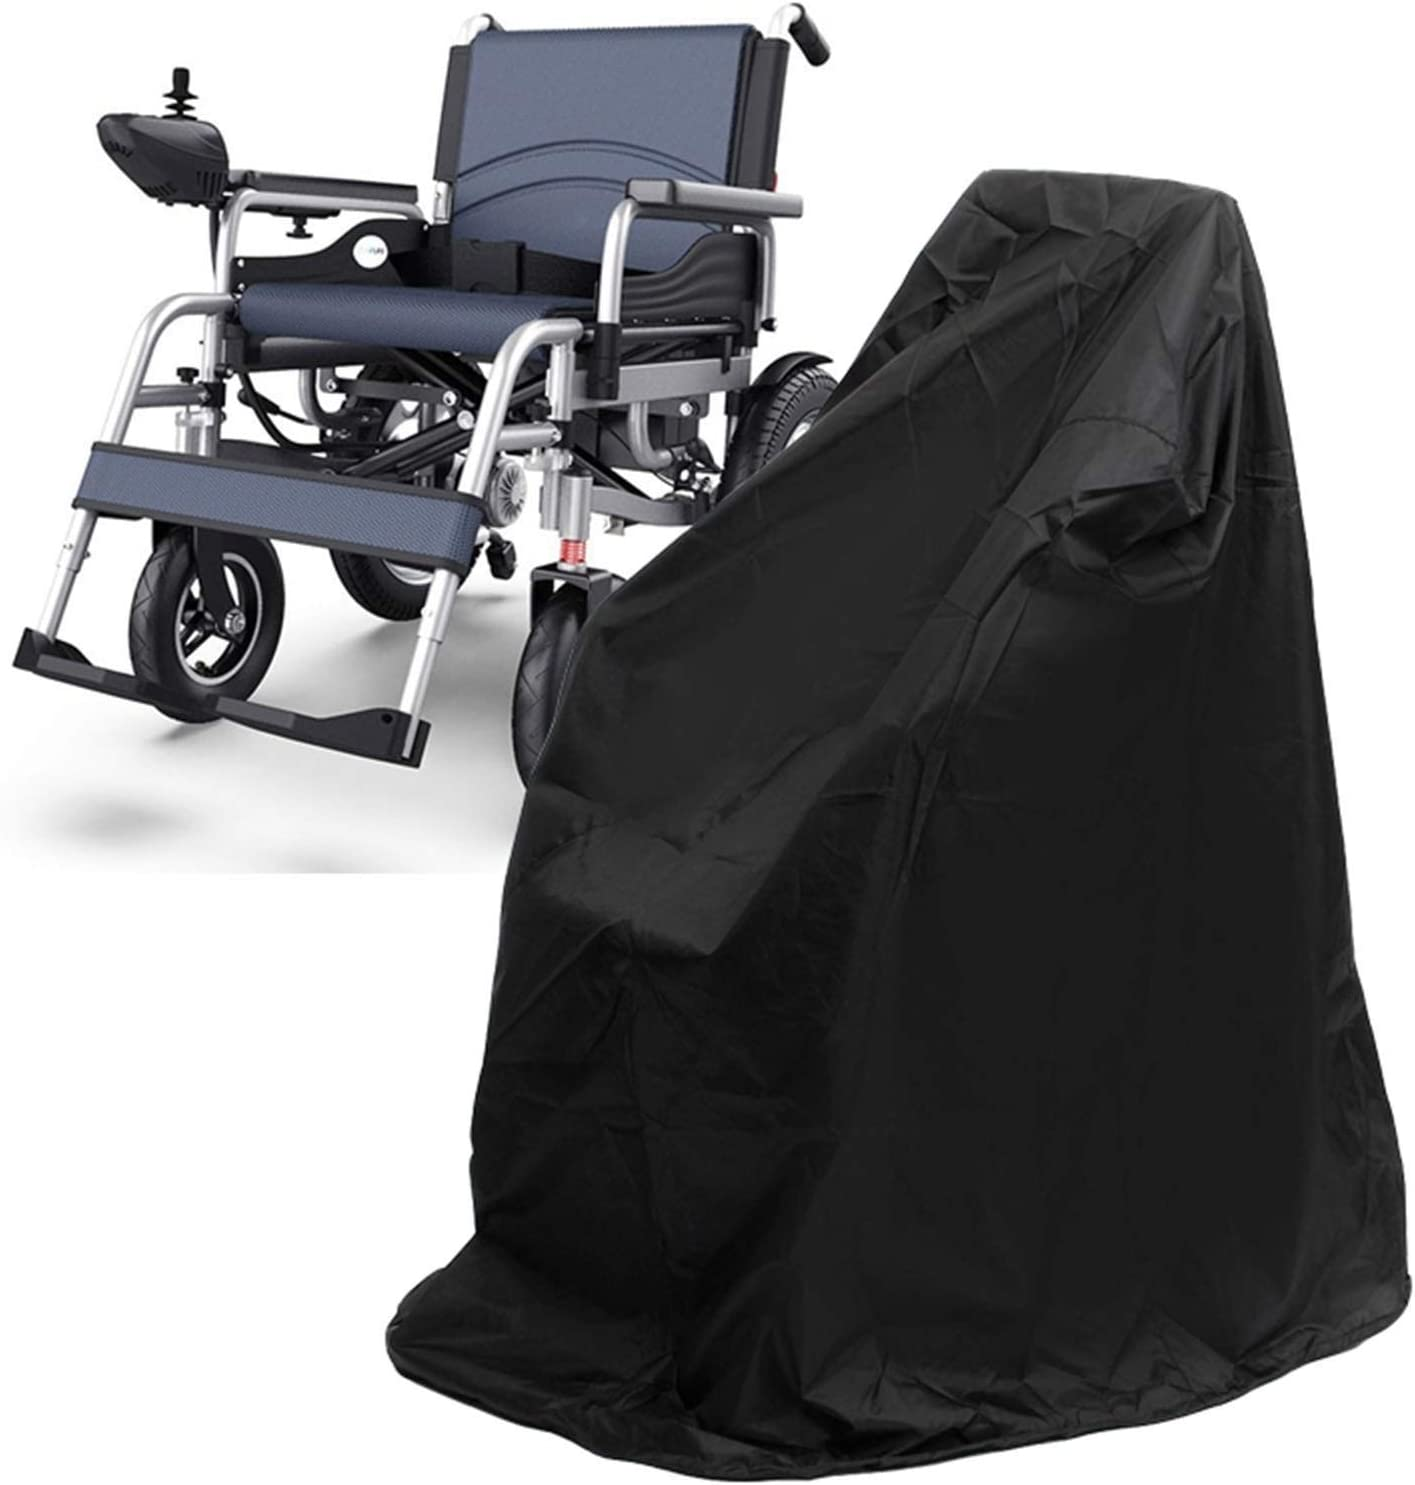 Funda for Scooter de Movilidad Lluvia Impermeable Sillas de Ruedas Plegables manuales eléctricas Cubierta de Lluvia al Aire Libre GHHQQZ (Color : Negro, Size : 118x72x120cm)